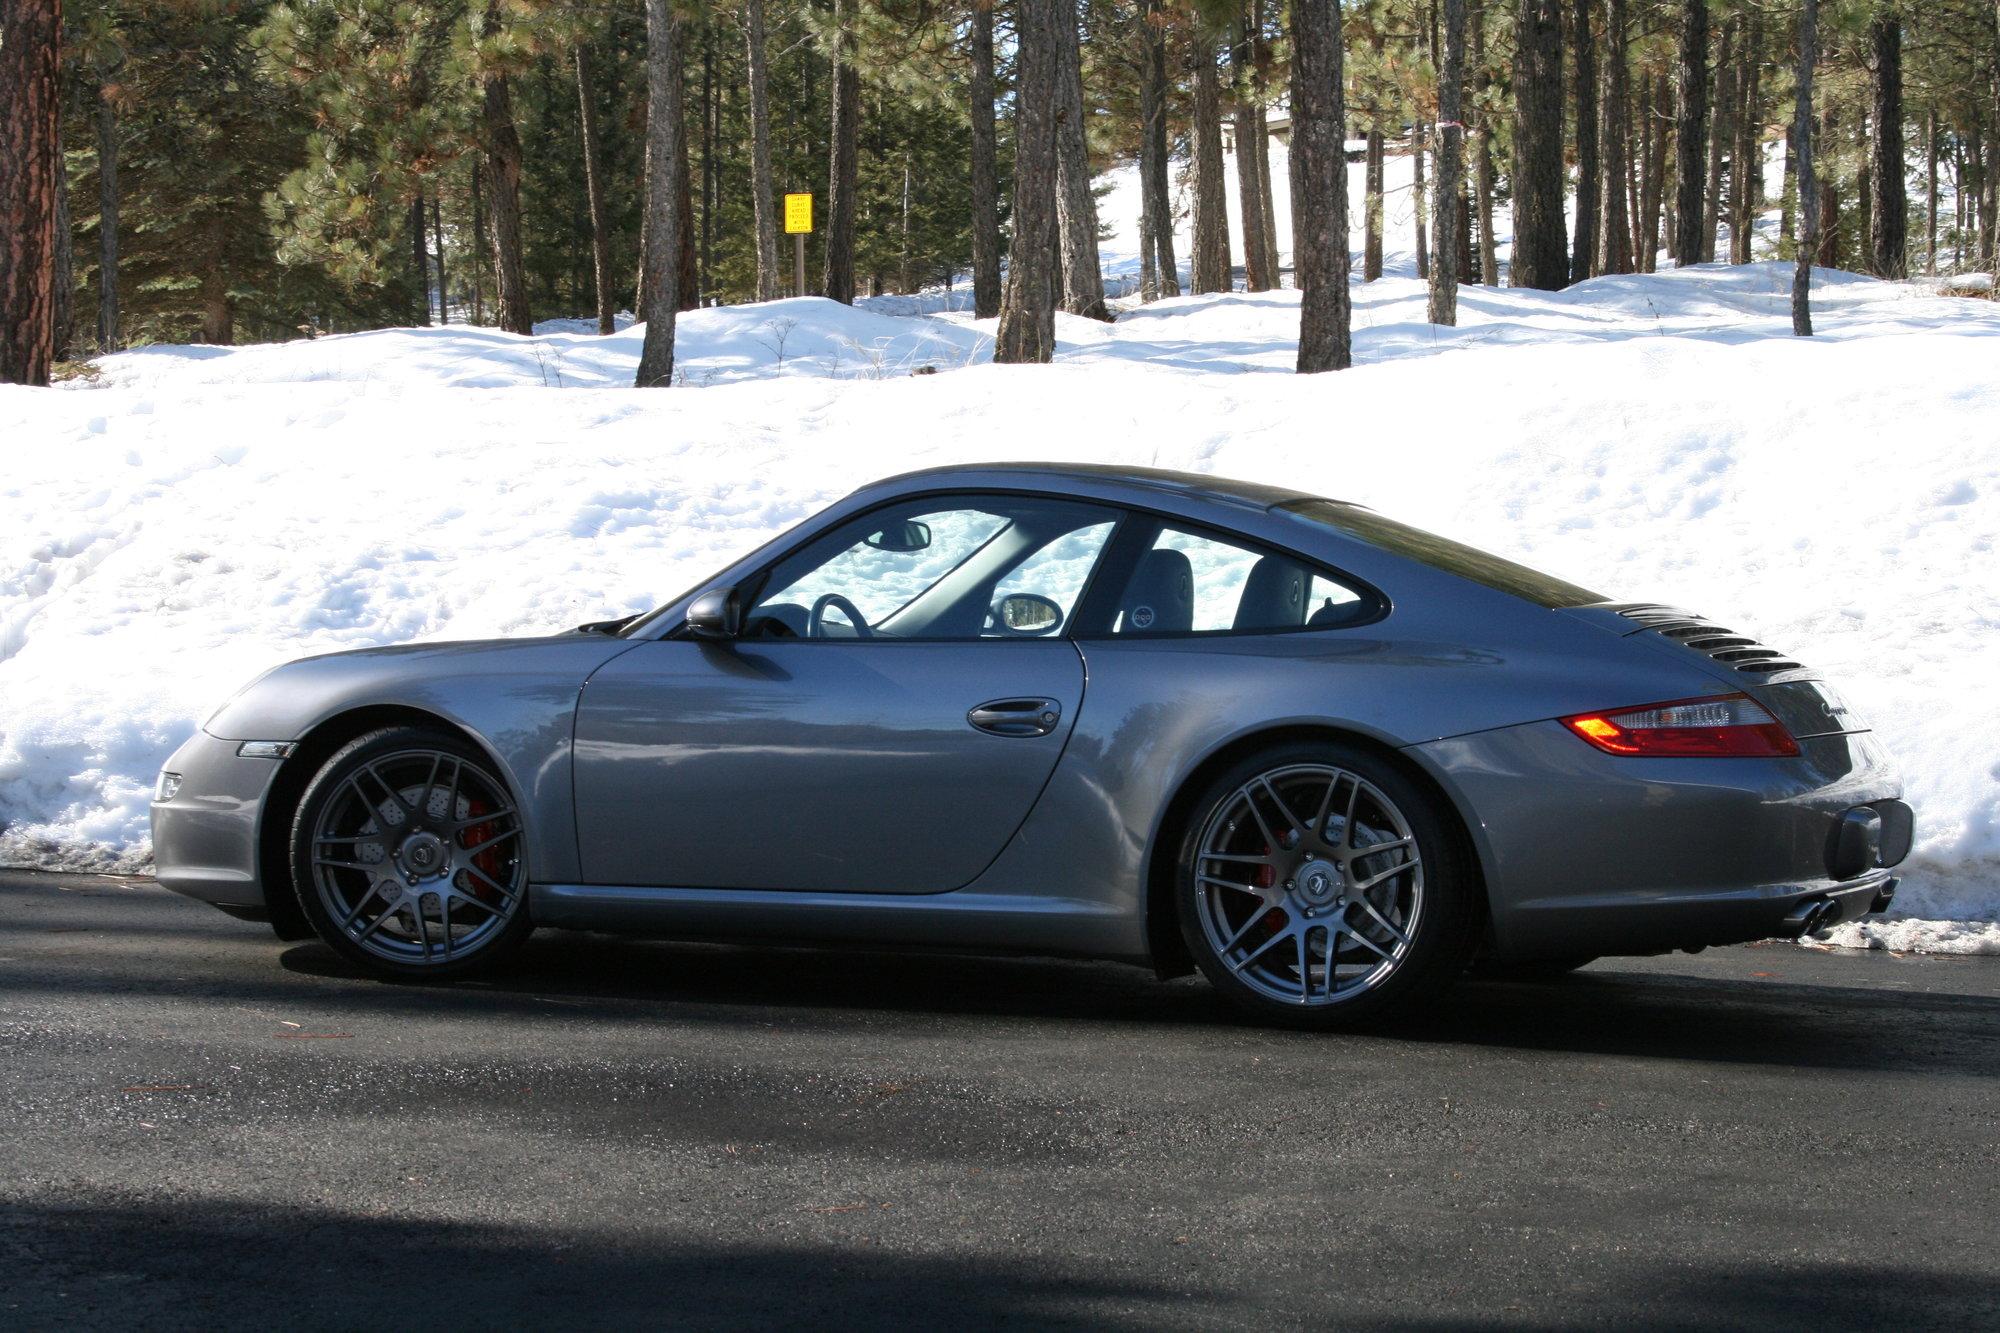 BC Racing Coilovers - 6SpeedOnline - Porsche Forum and Luxury Car